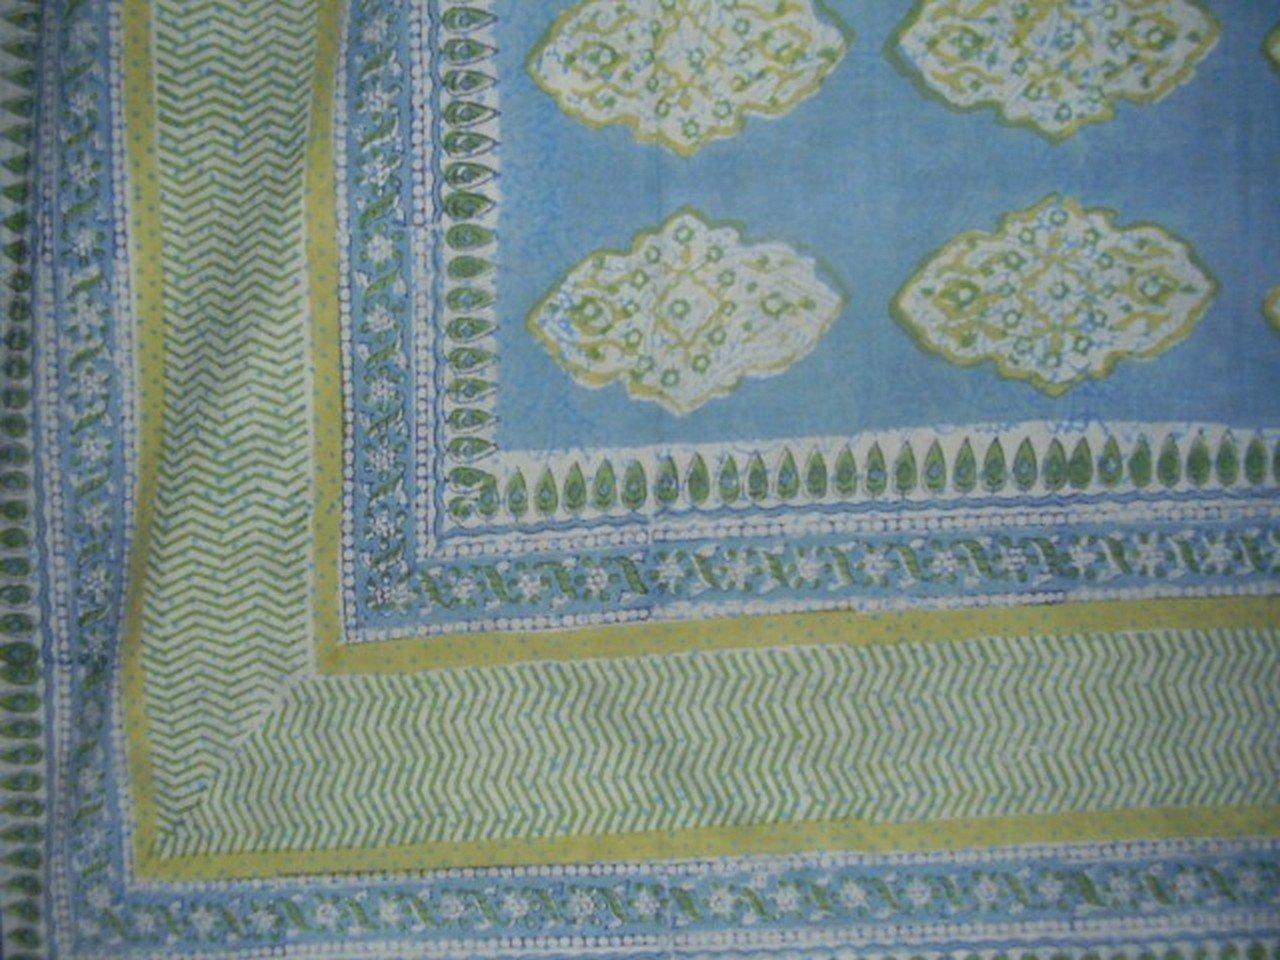 Homestead Kensington Block Print Tapestry Cotton Bedspread 108'' x 88'' Full-Queen Blue